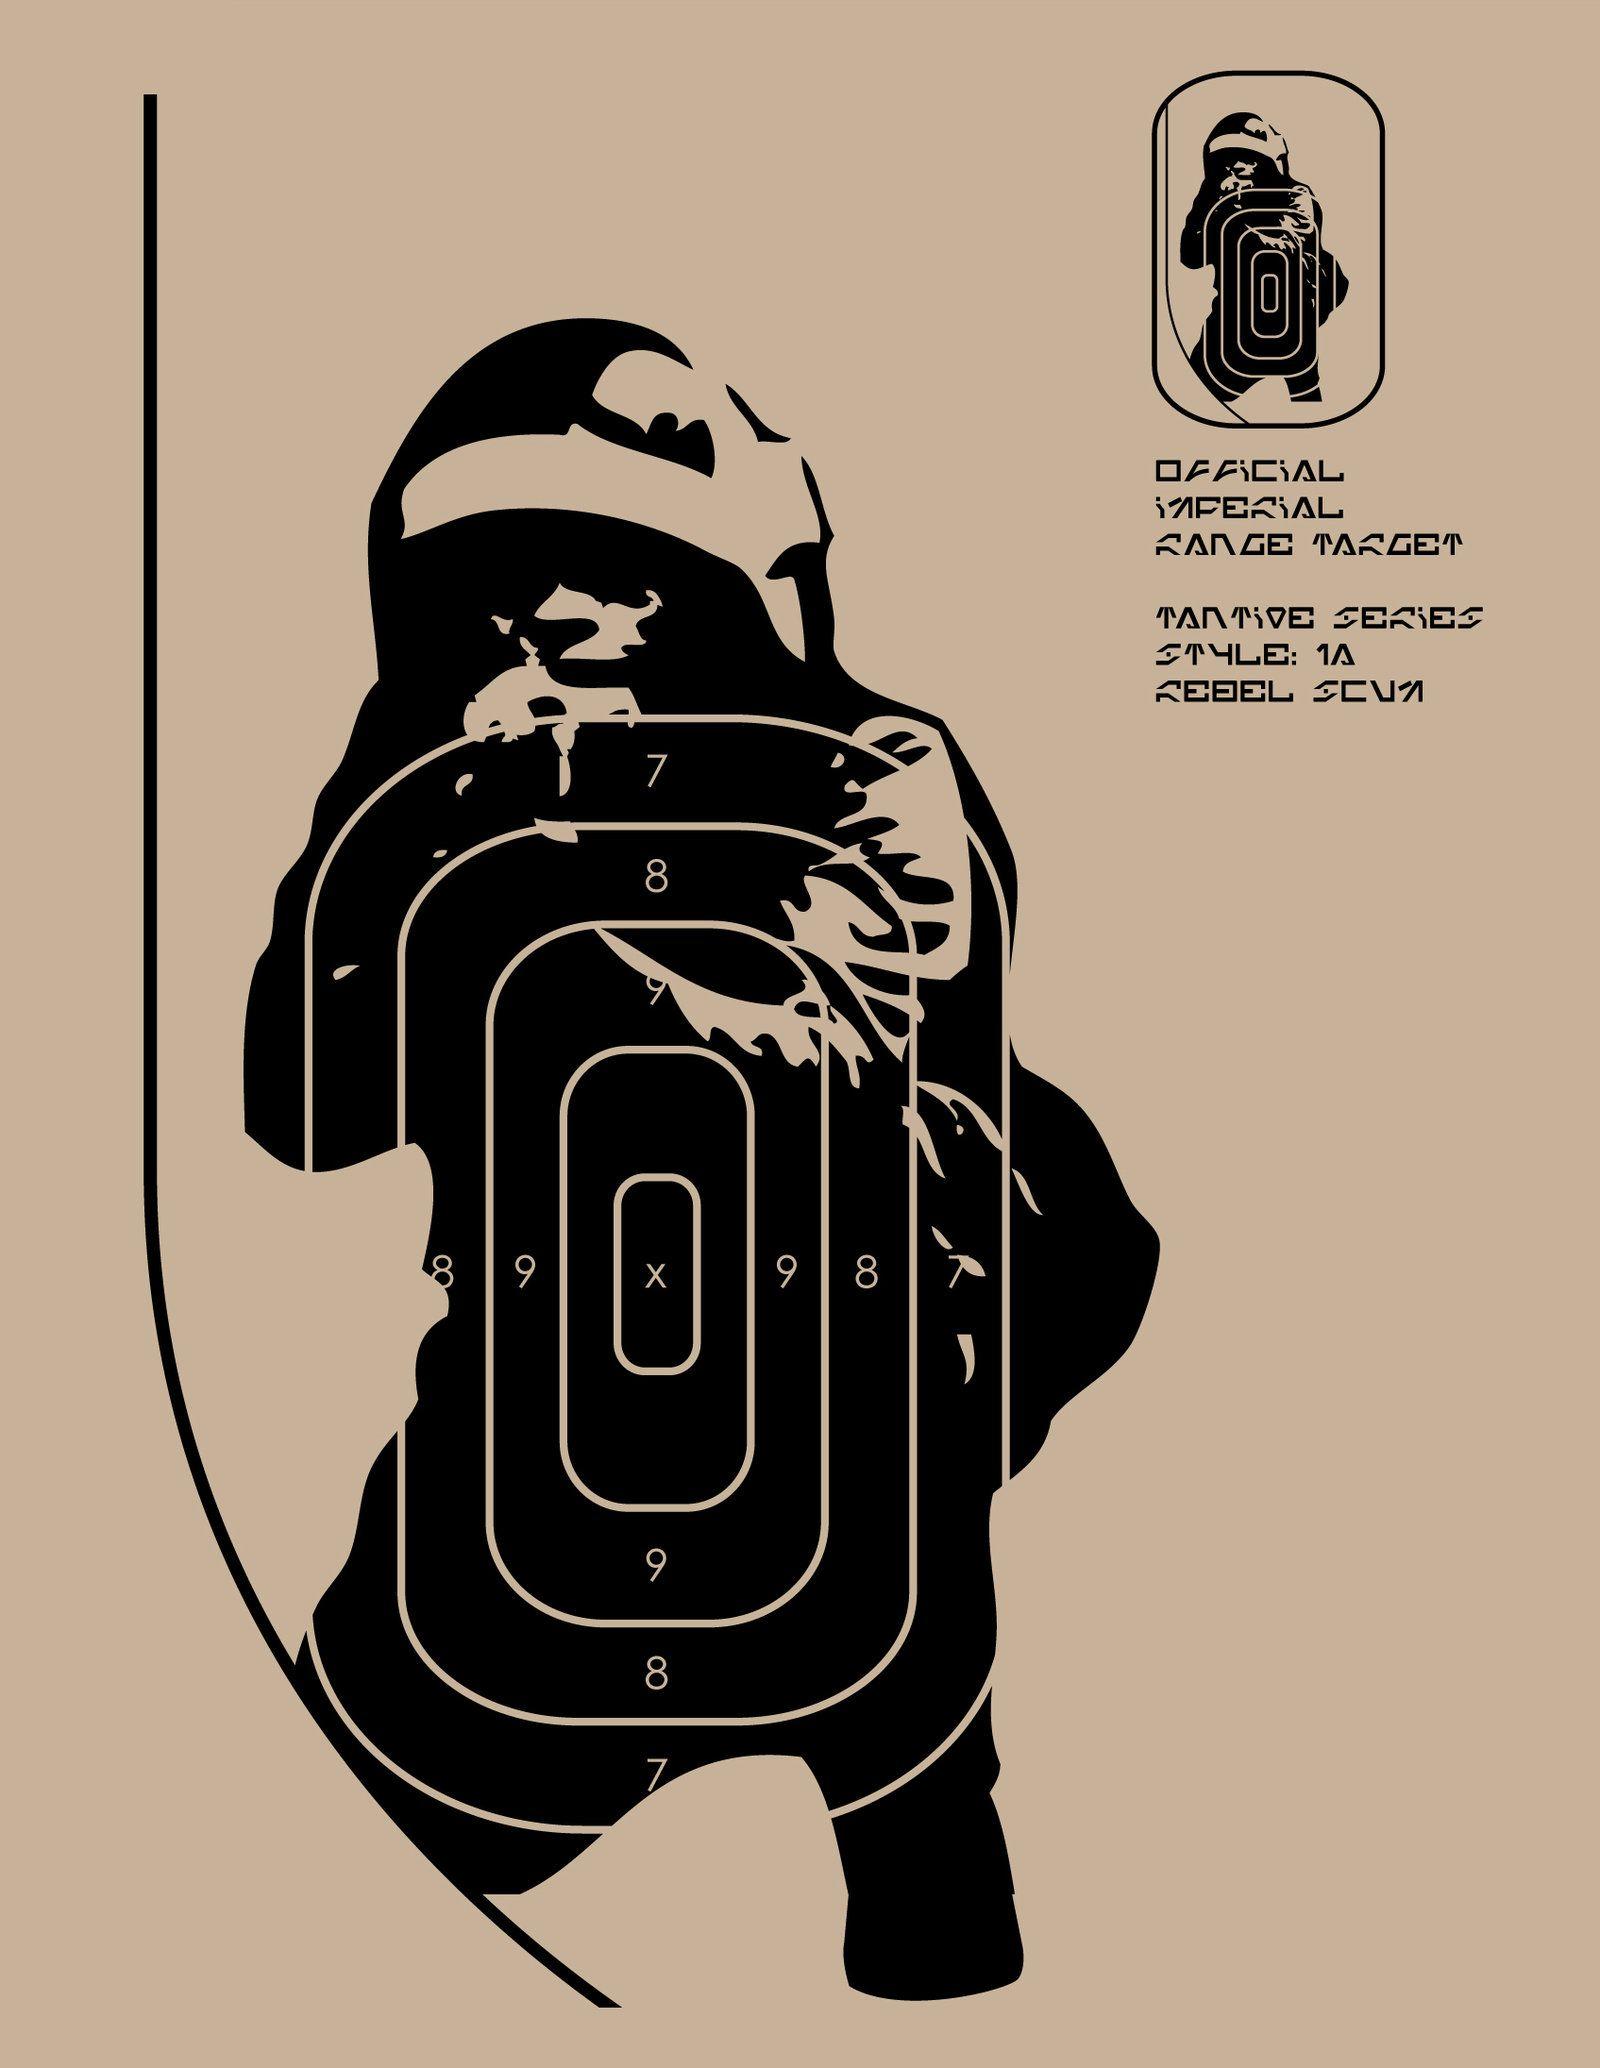 9b0c7b9ba6b1 stormtrooper target practice by theCrow65.deviantart.com ...